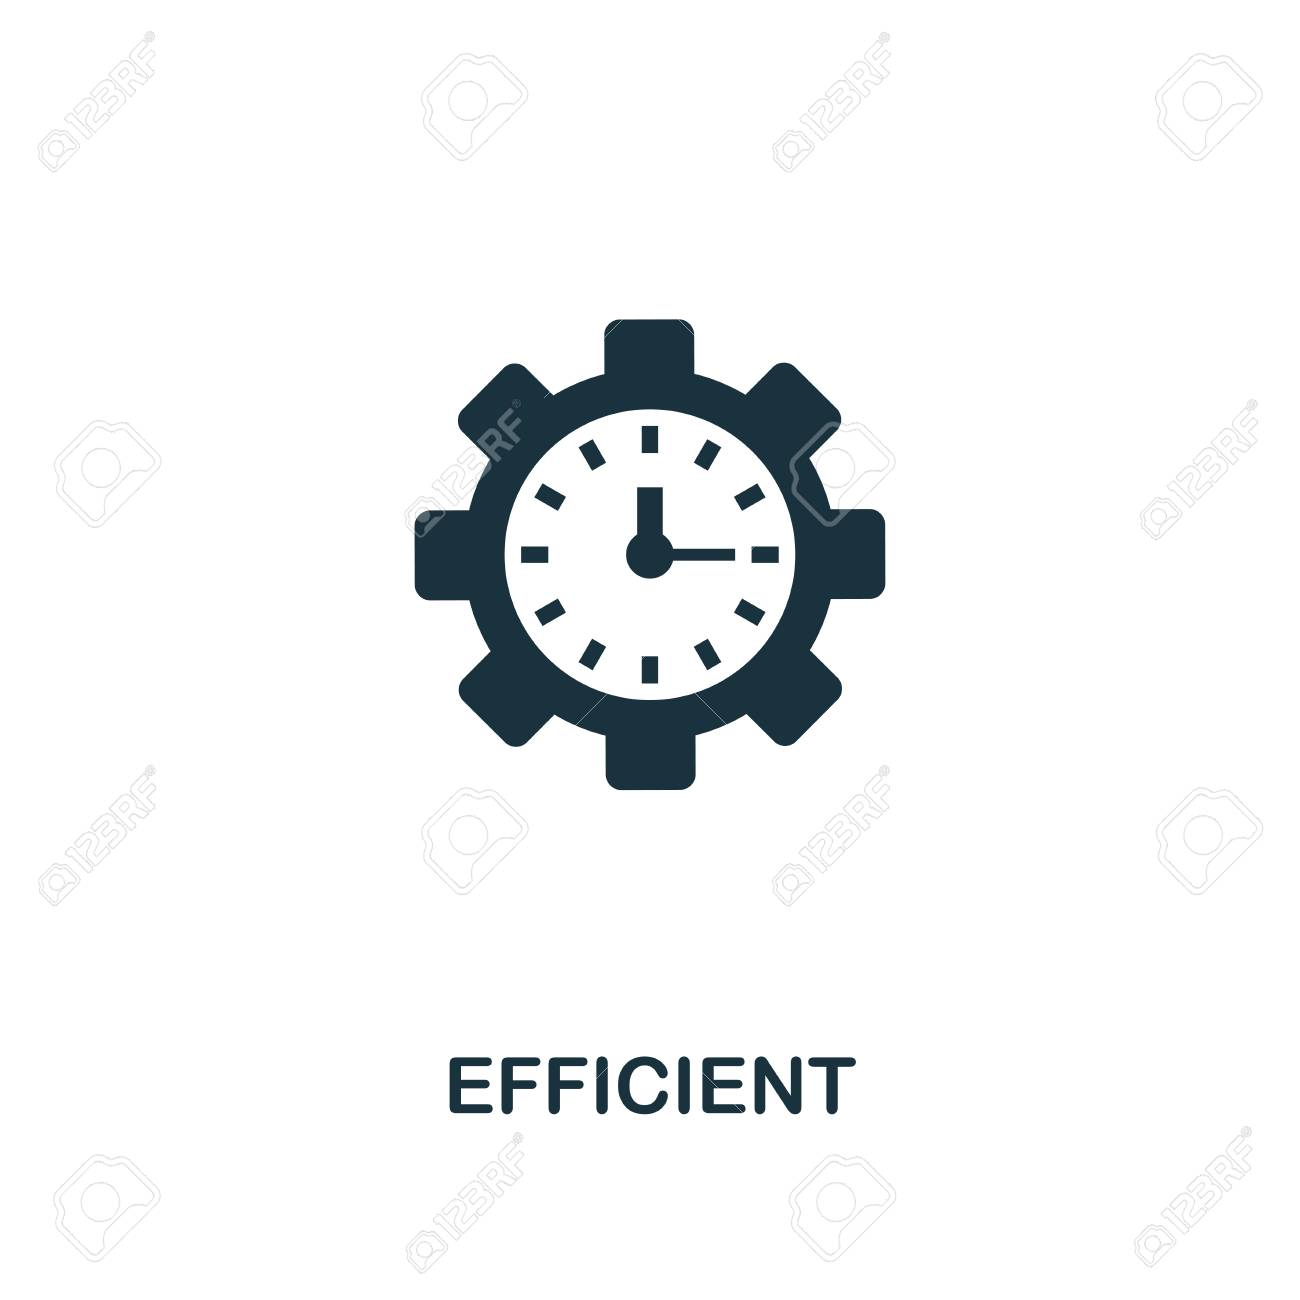 Efficient icon  Premium style design, pixel perfect efficient